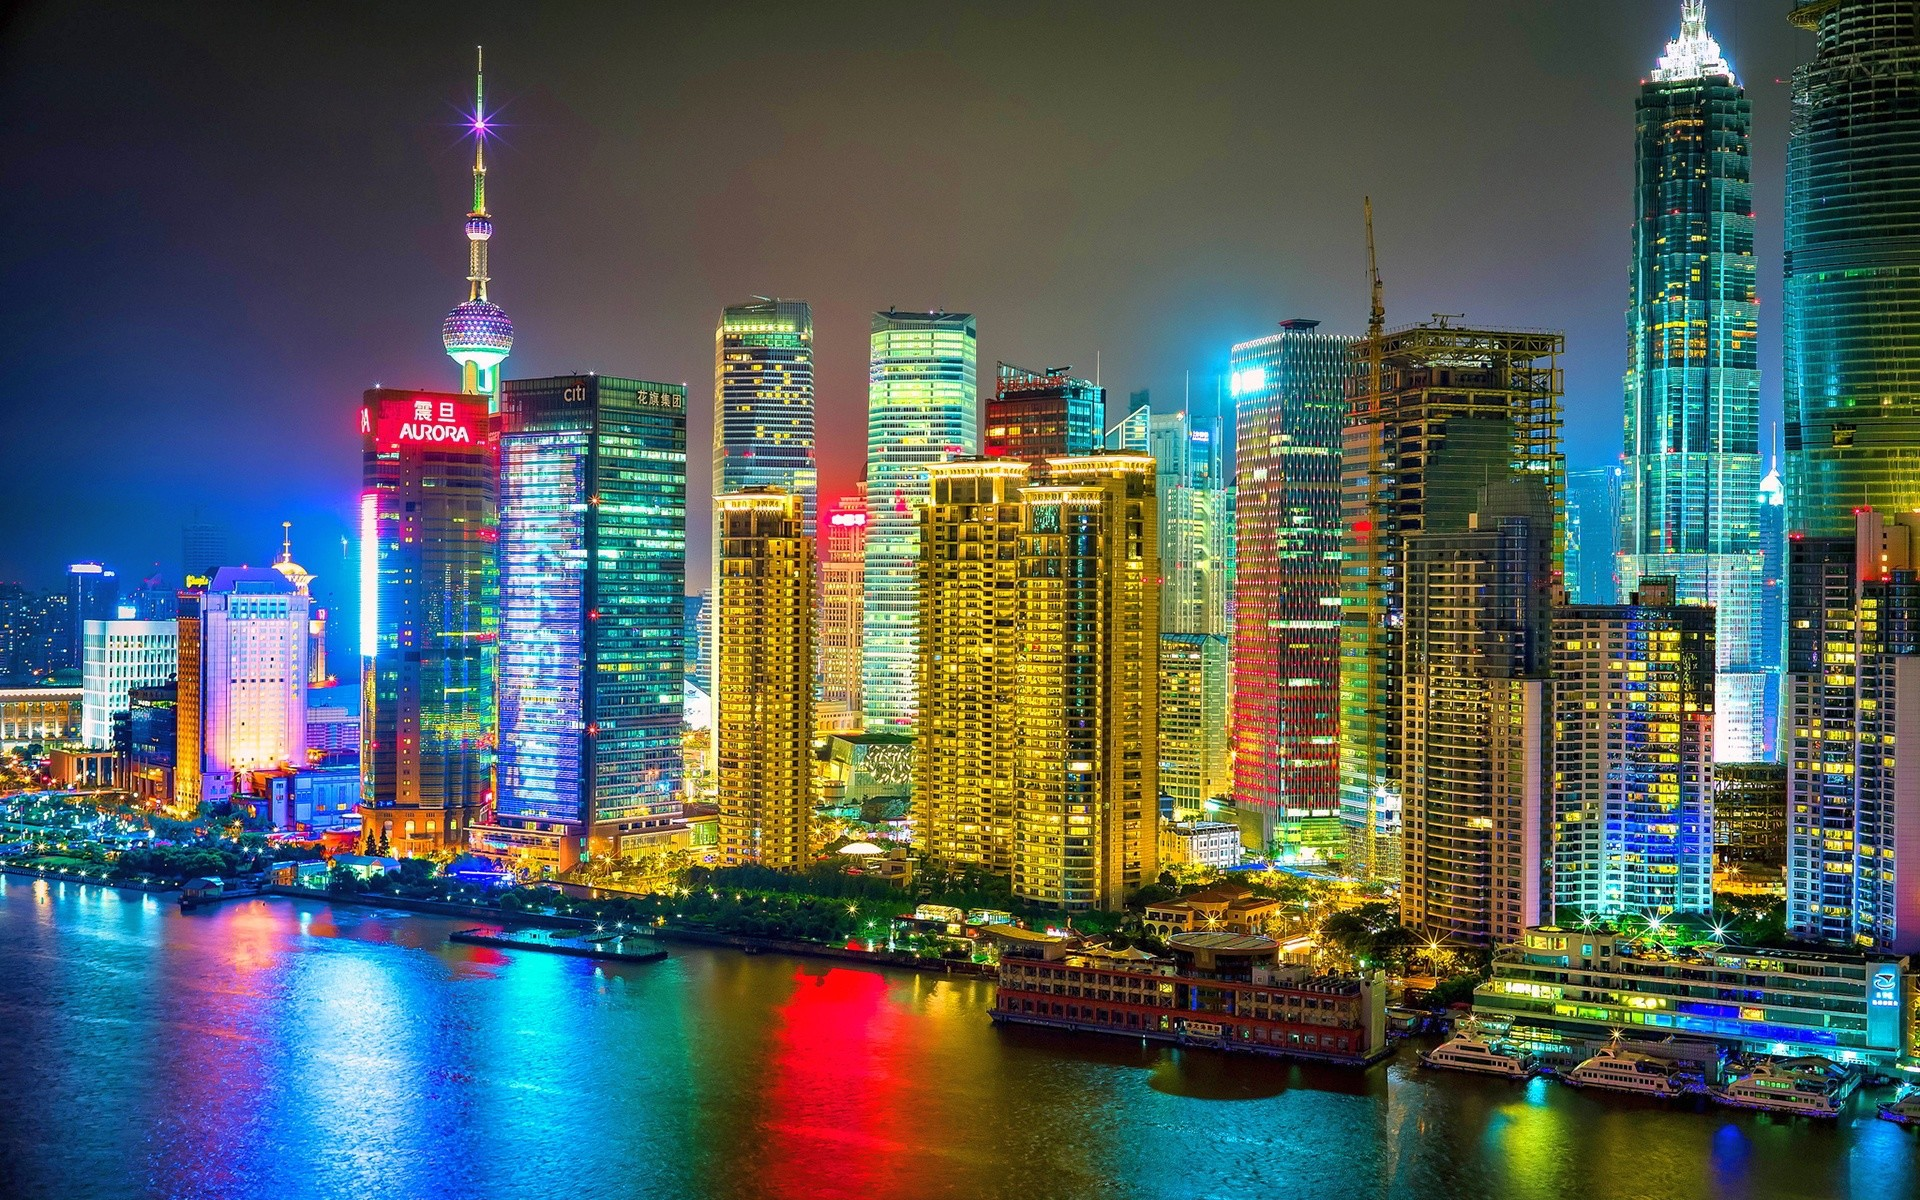 Colorful Shanghai City Night HD Wallpaper